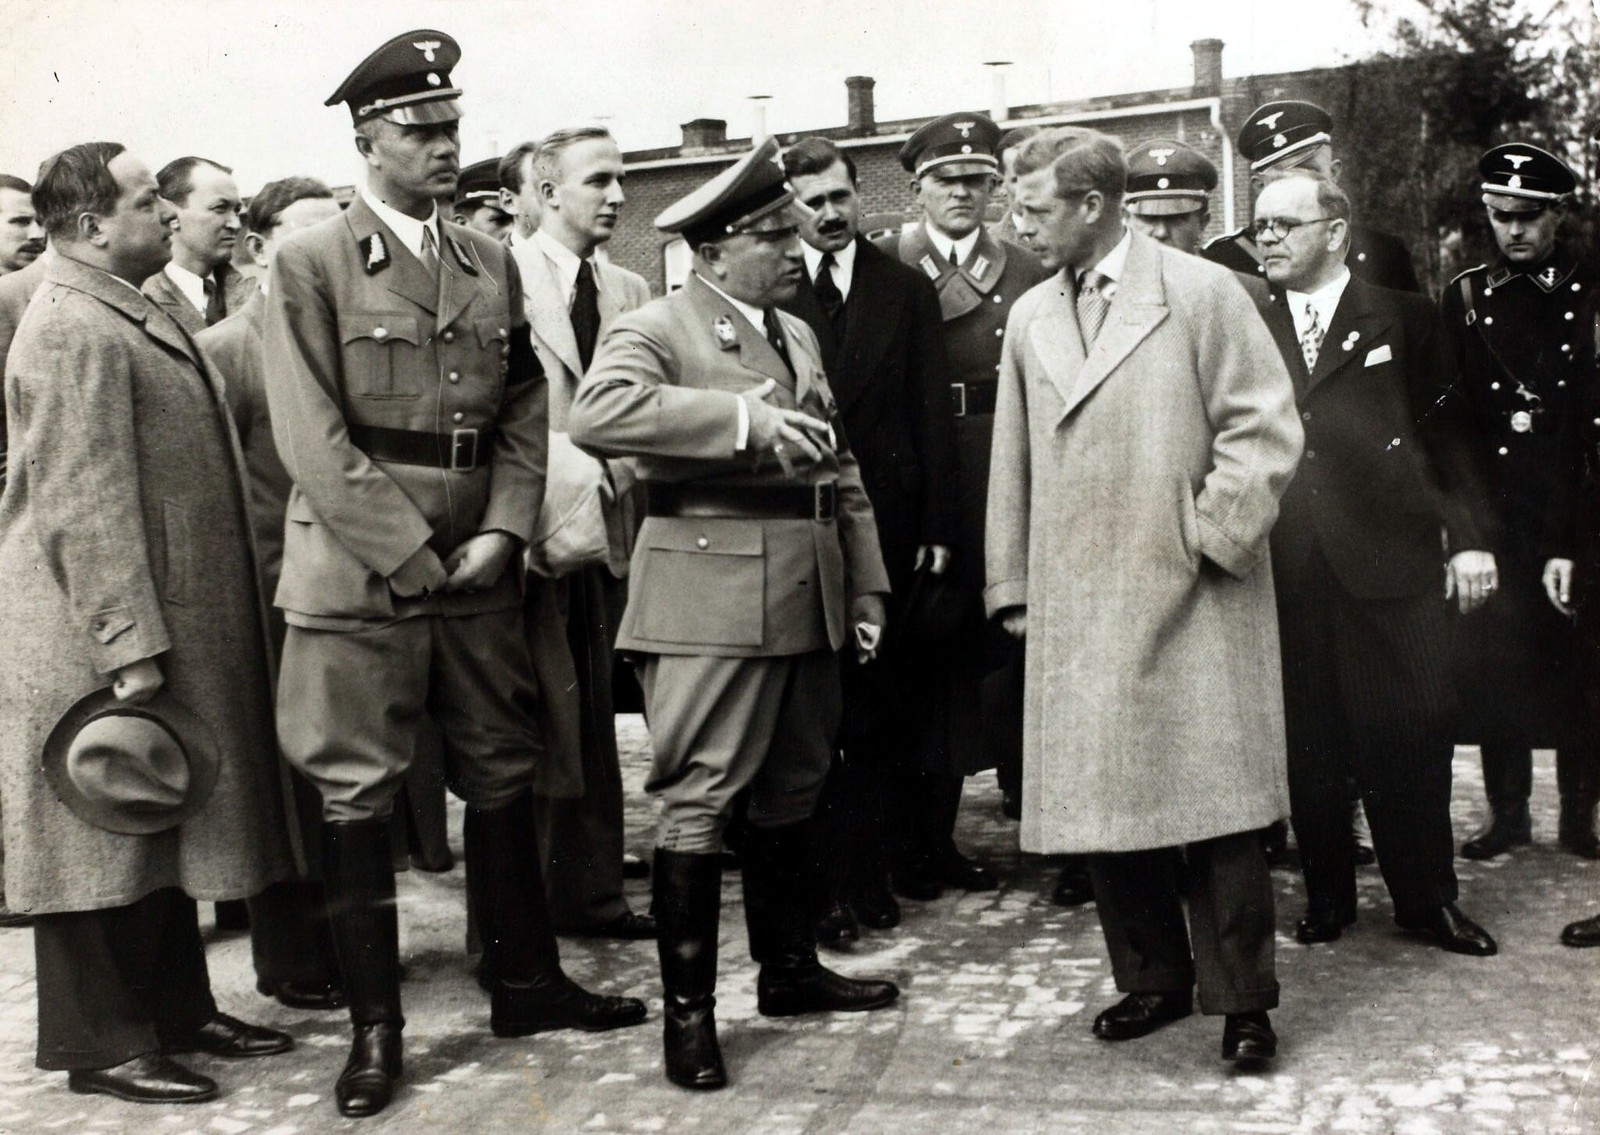 18 октября. Герцог Виндзорский с руководителем Германского трудового фронта доктором Робертом Леем.